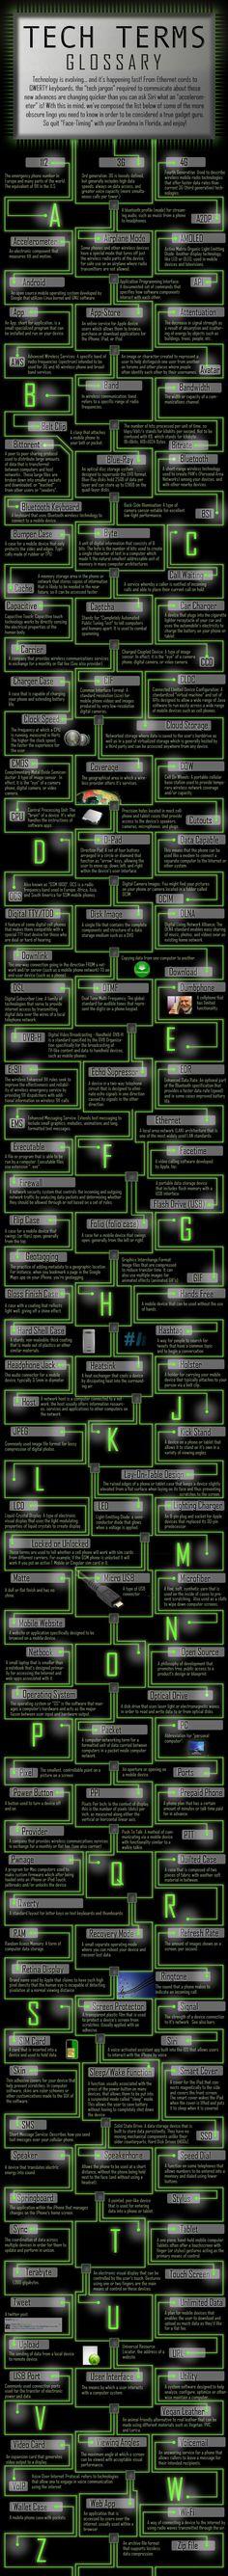 Tech terms glossary #infografia #infographic